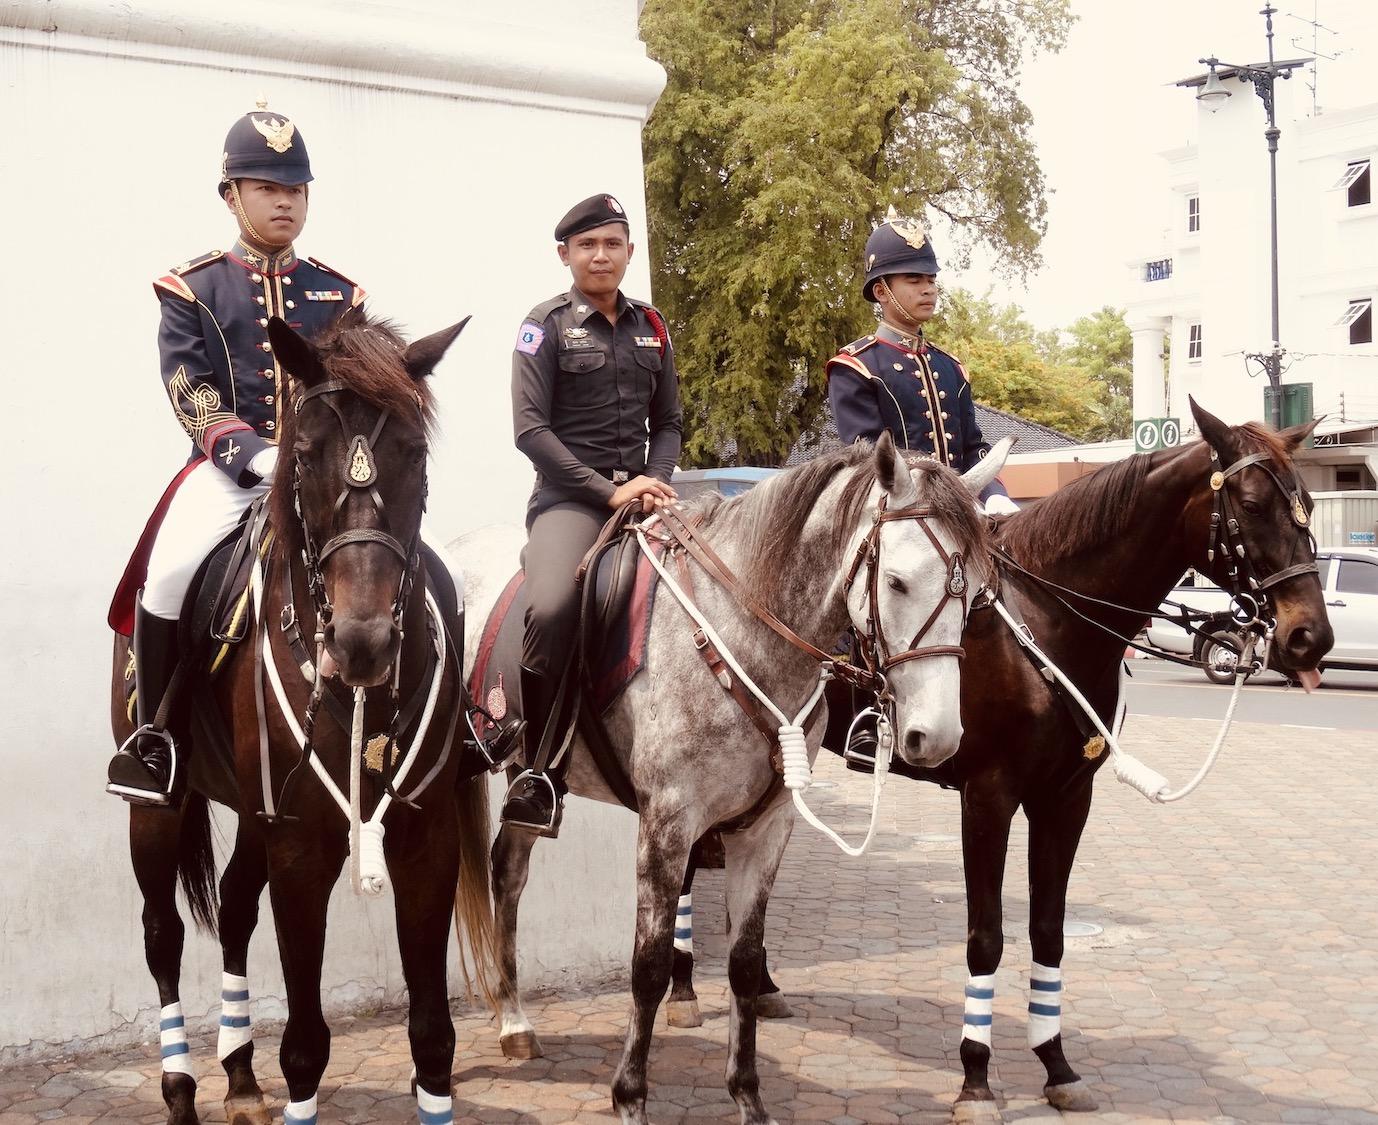 Thai soldiers on horseback